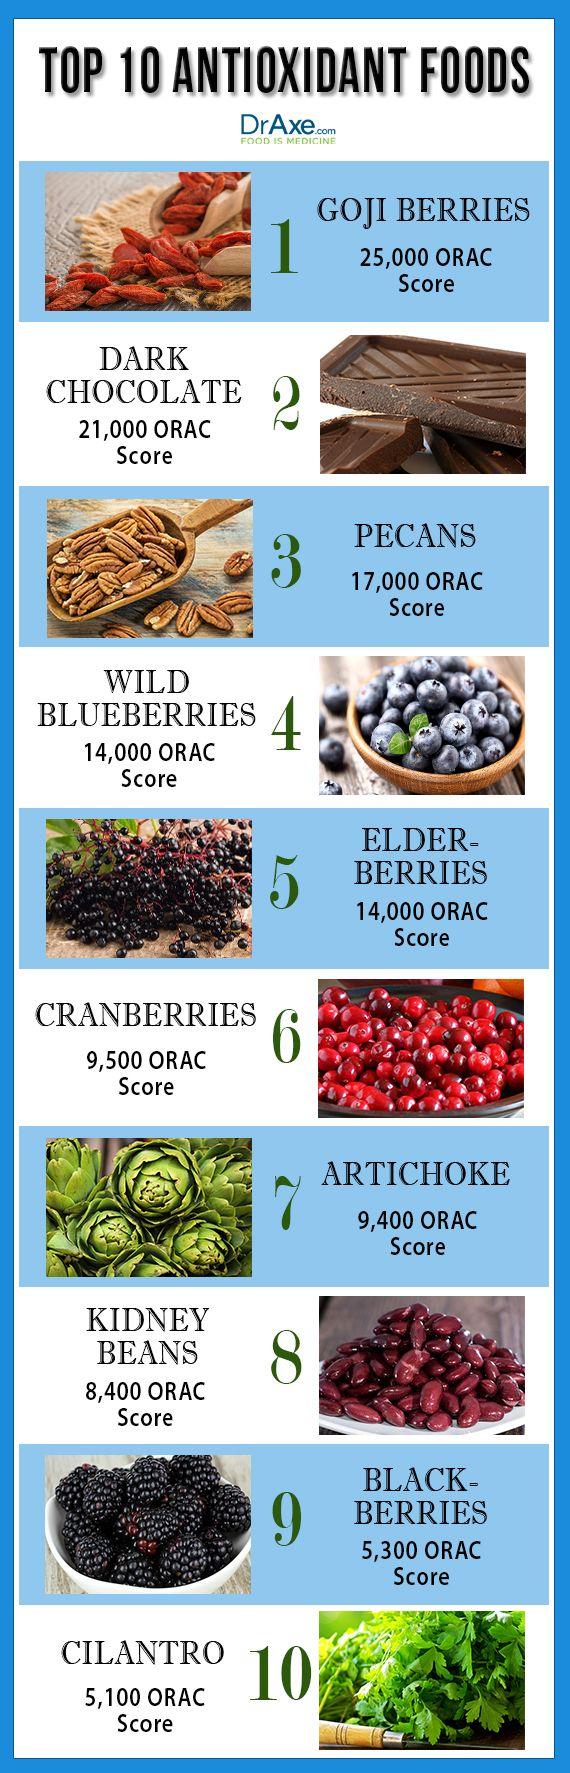 top 10 Antioxidant foods list